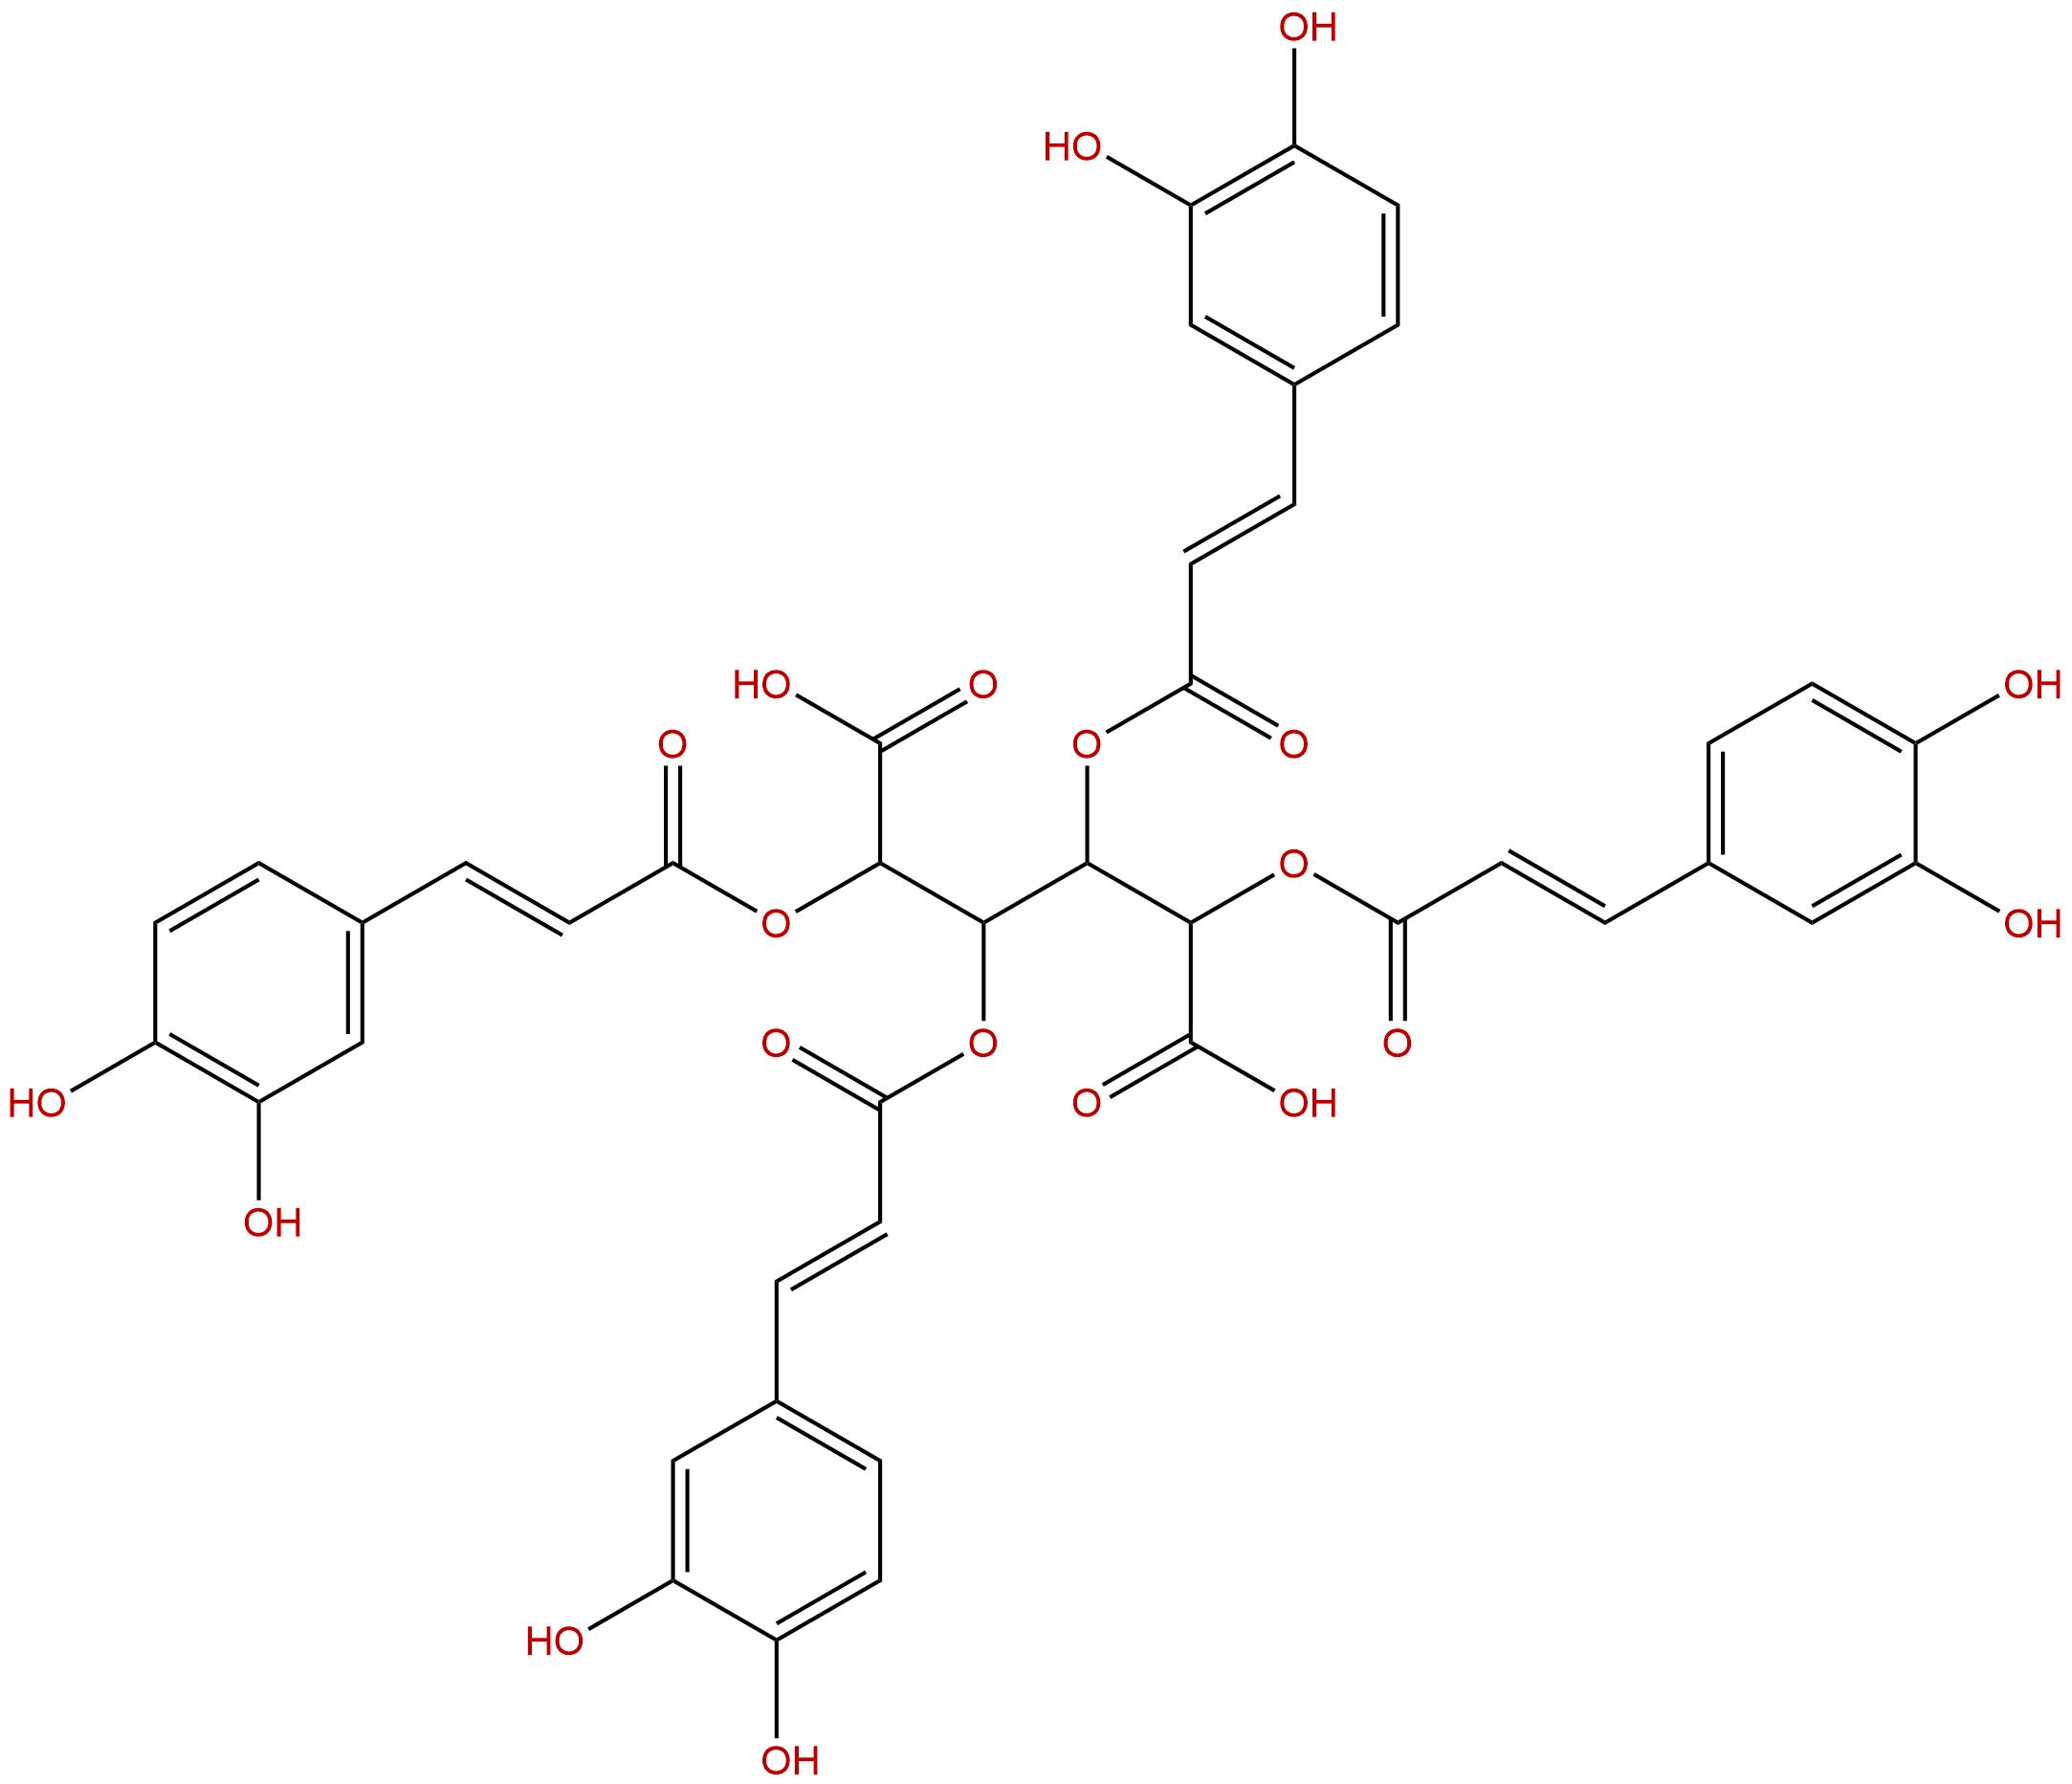 2,3,4,5-Tetracaffeoyl-D-Glucaric acid